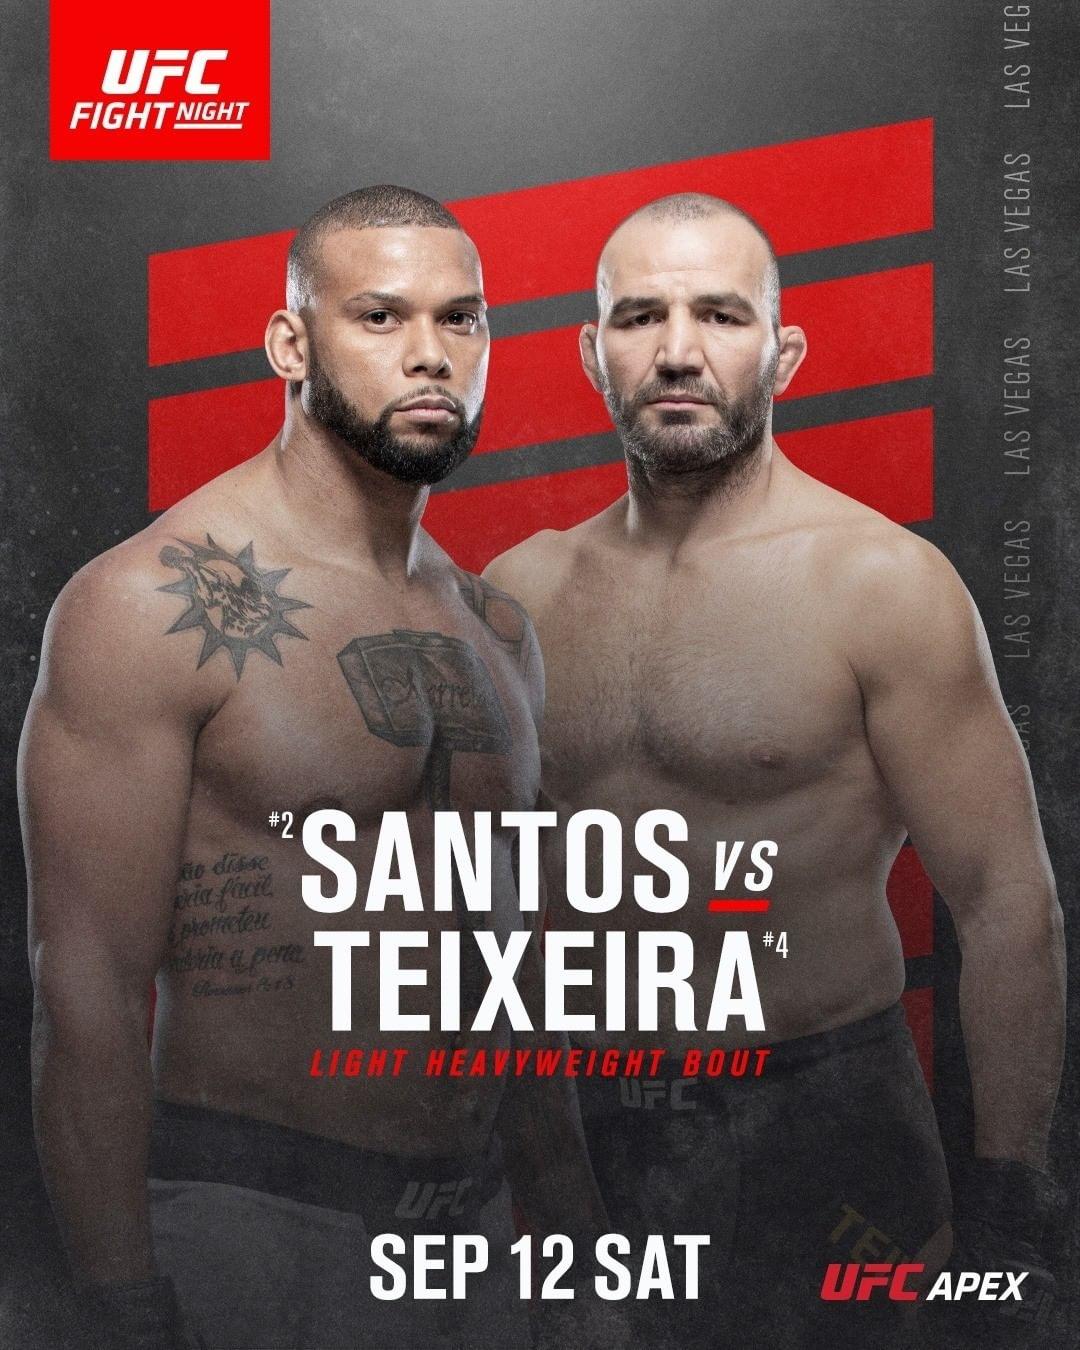 UFC Fight Night: Сантос - Тейшейра